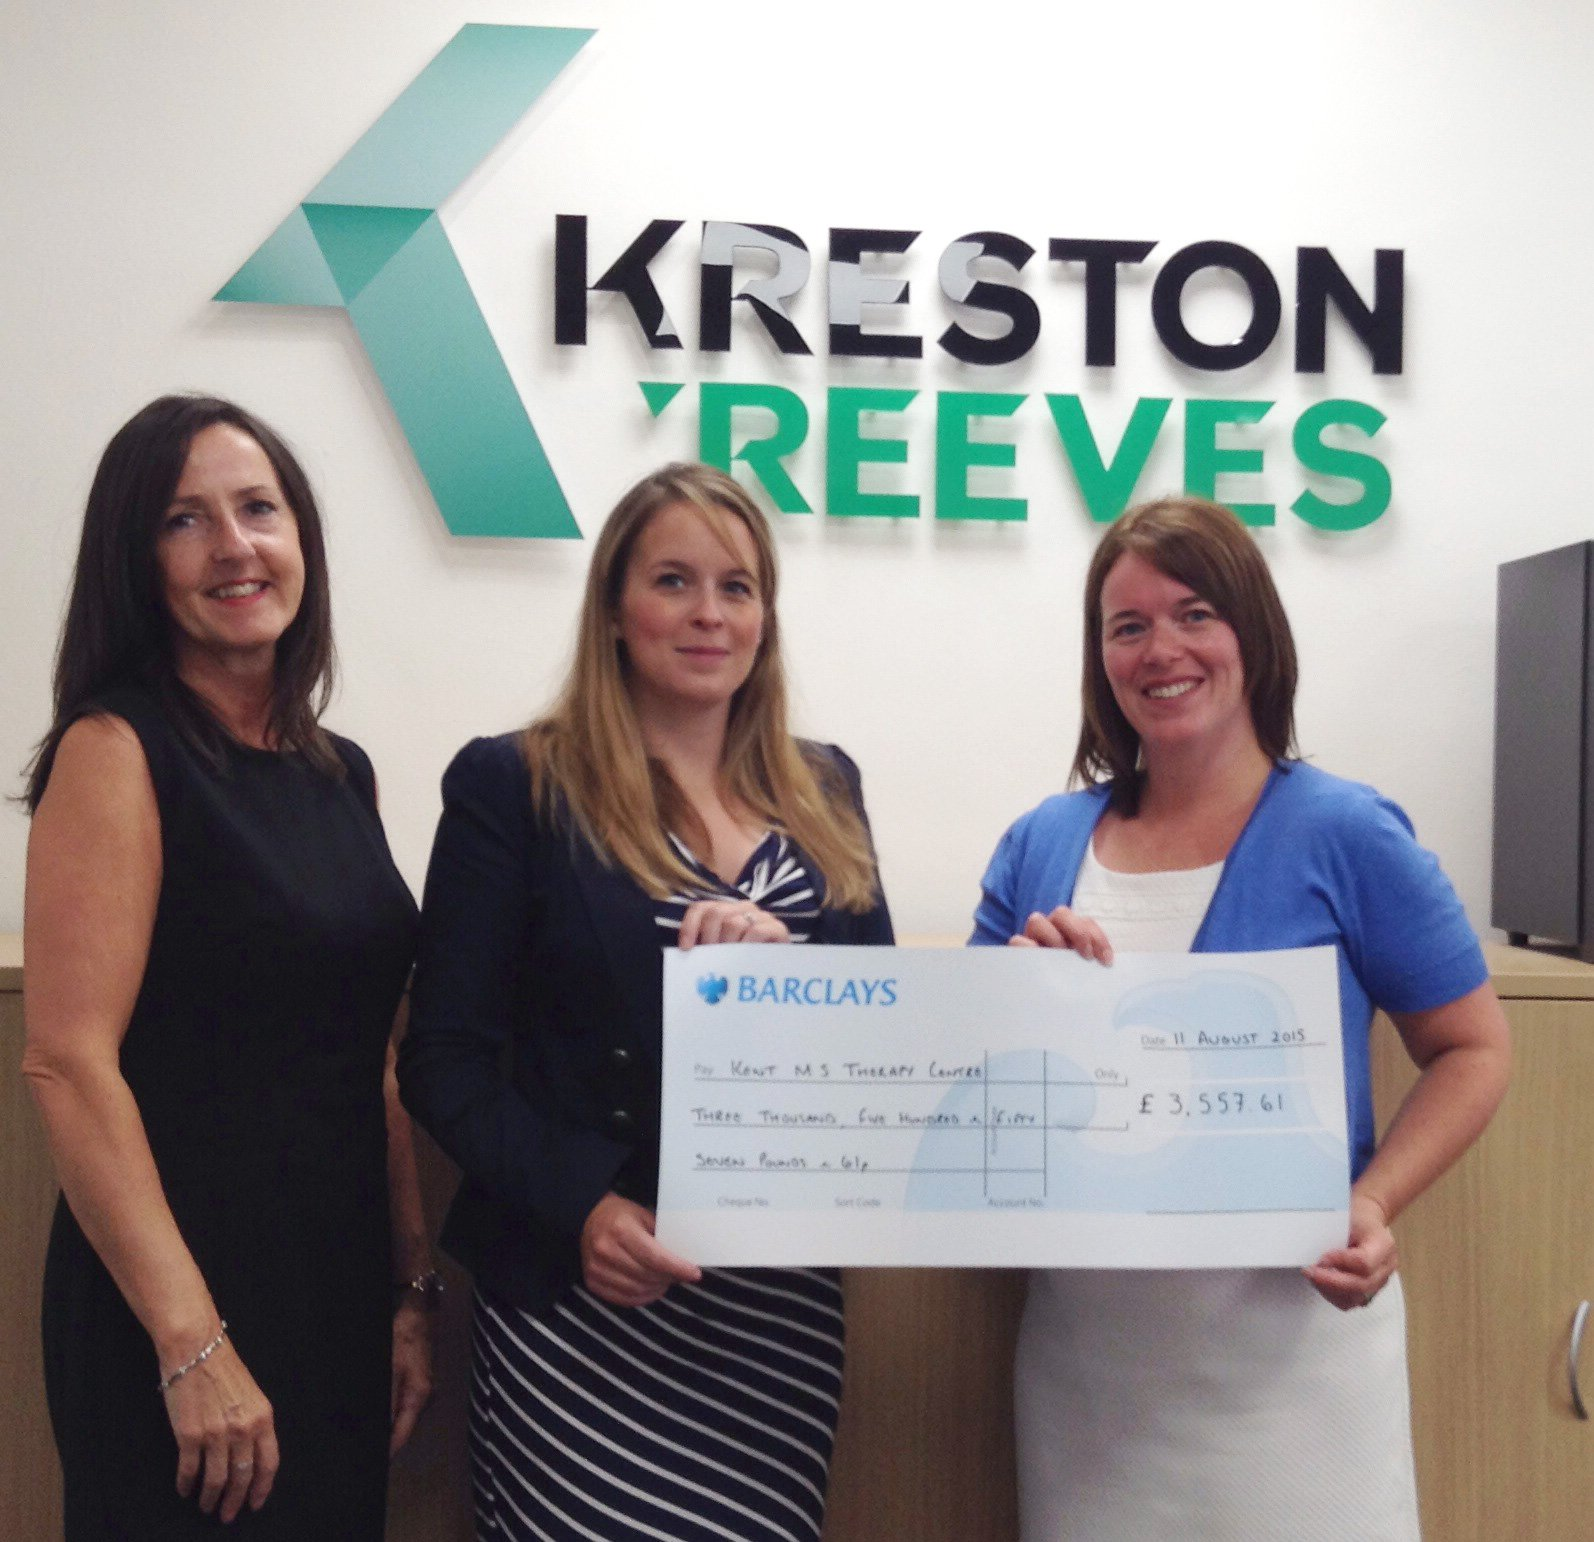 Kreston Reeves fundraising for KMSTC